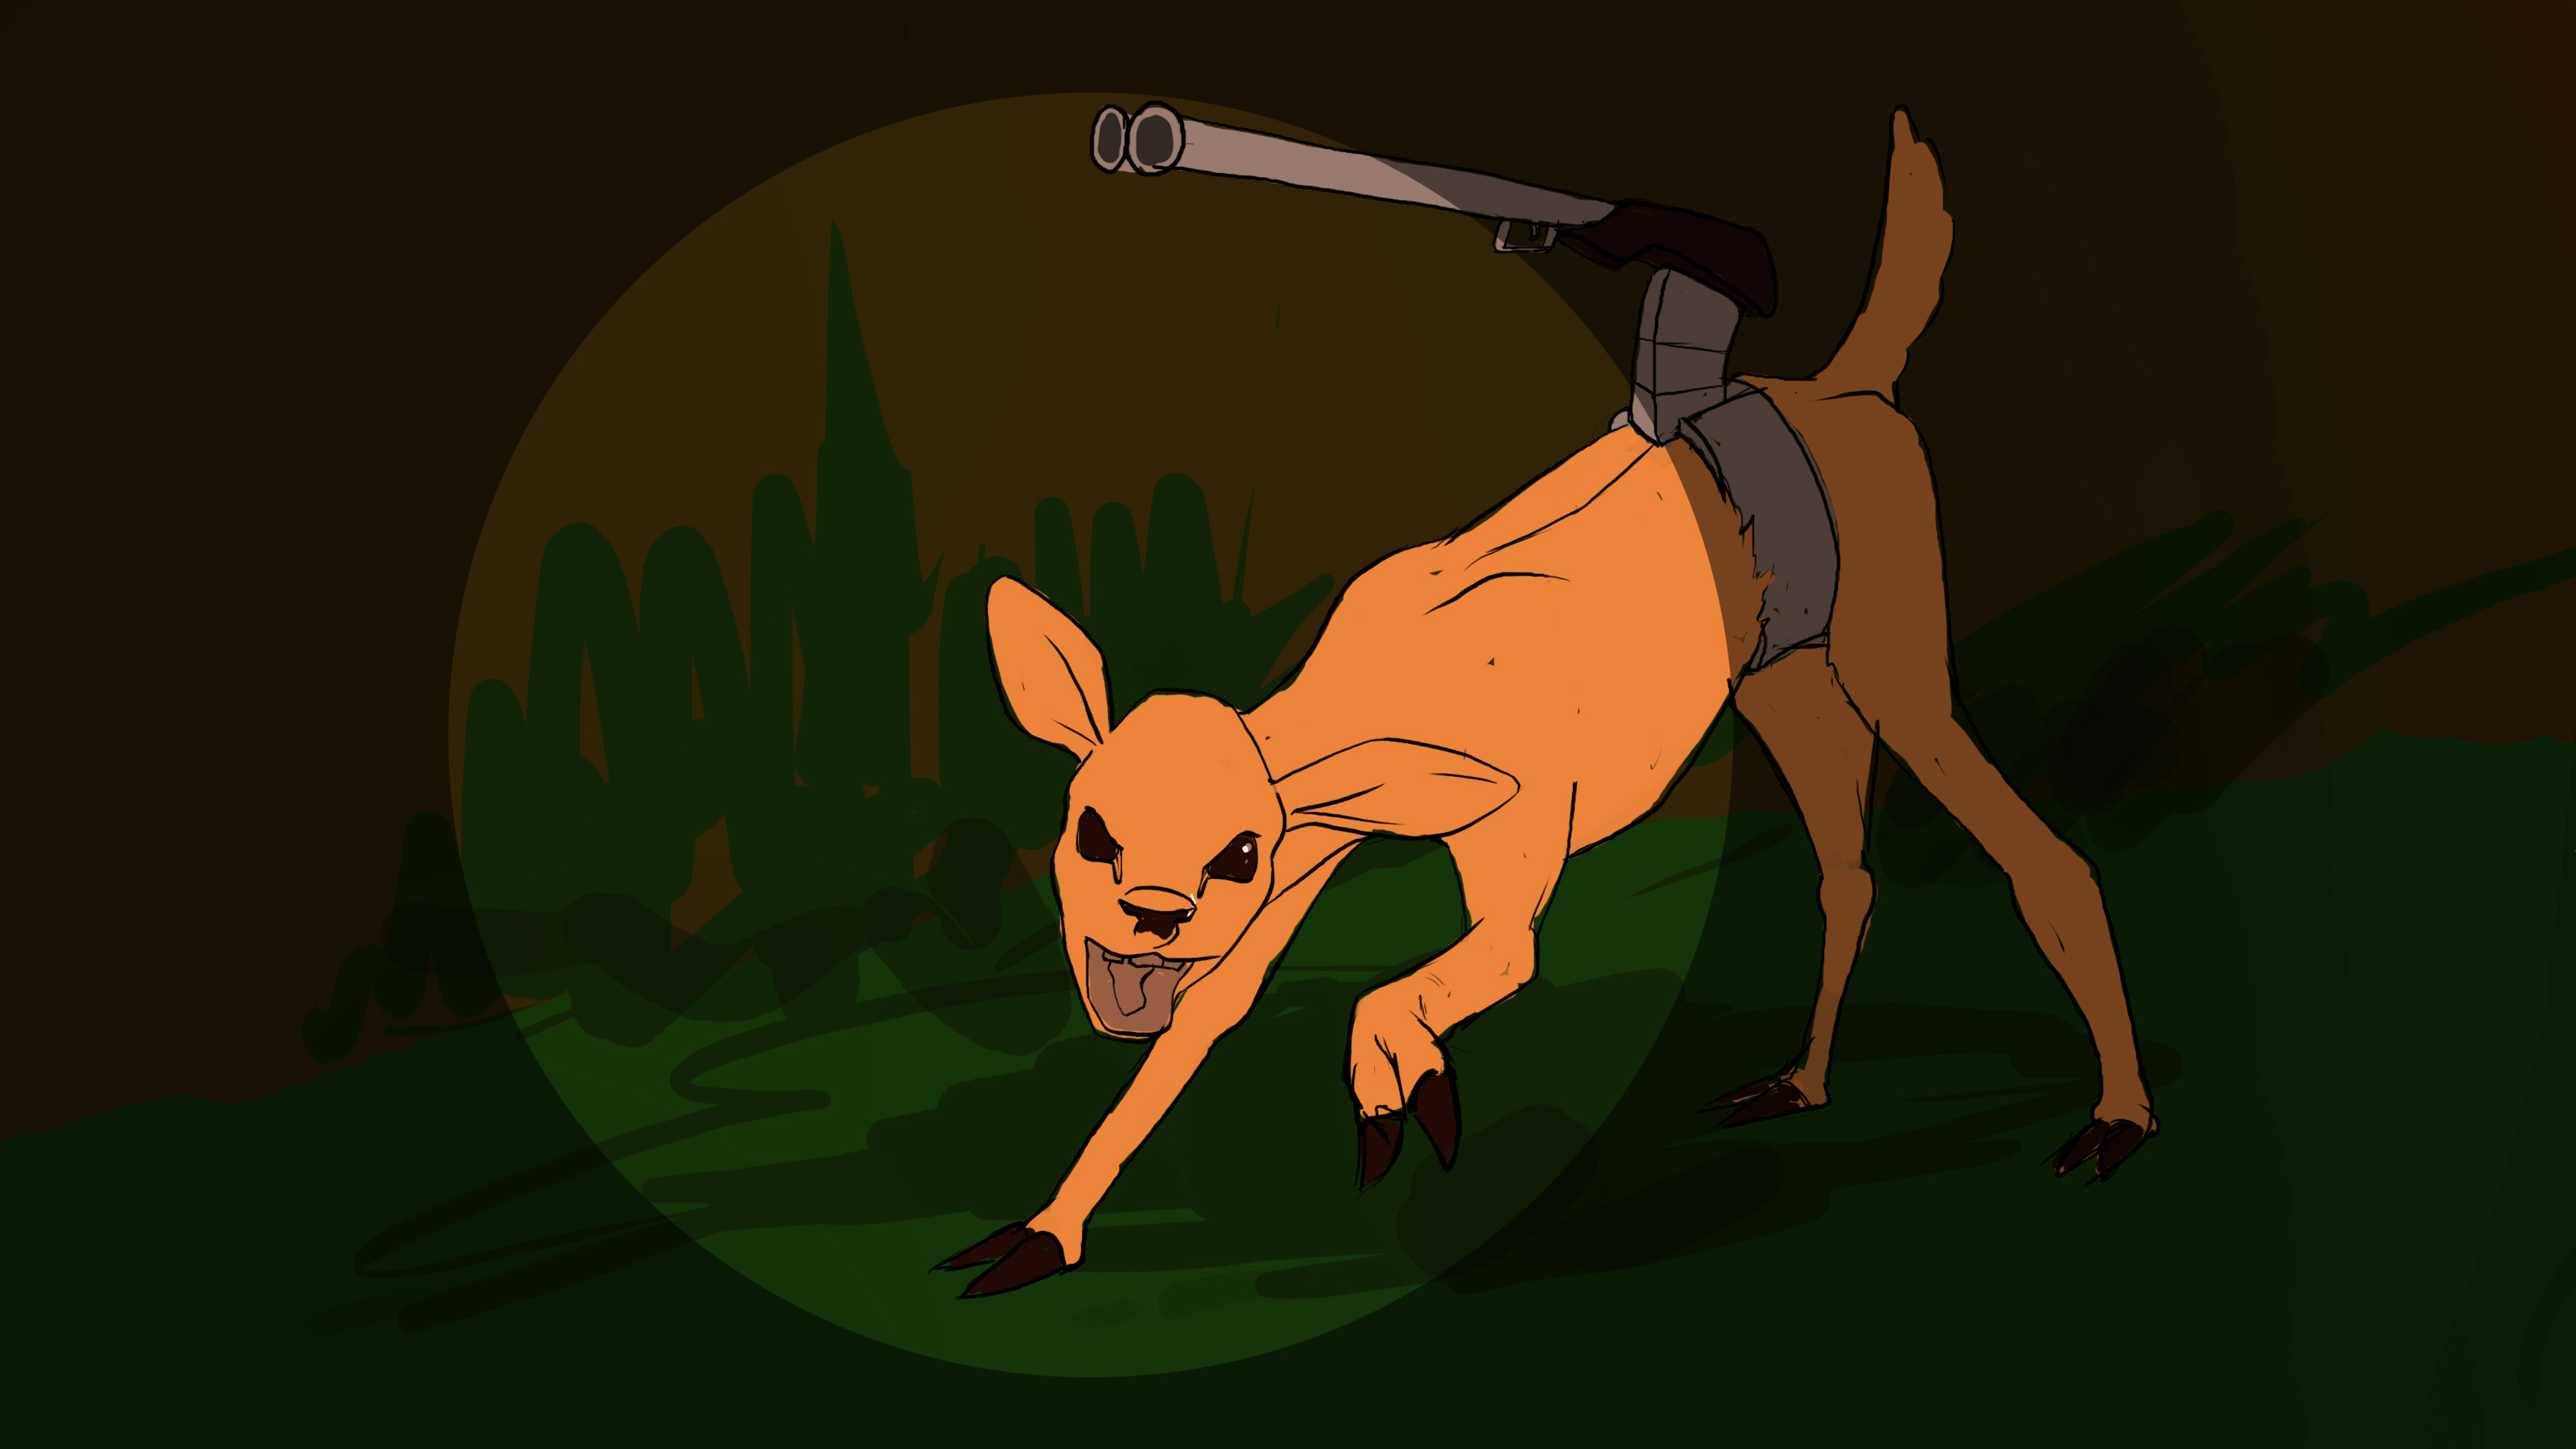 Deer Has a Rifle